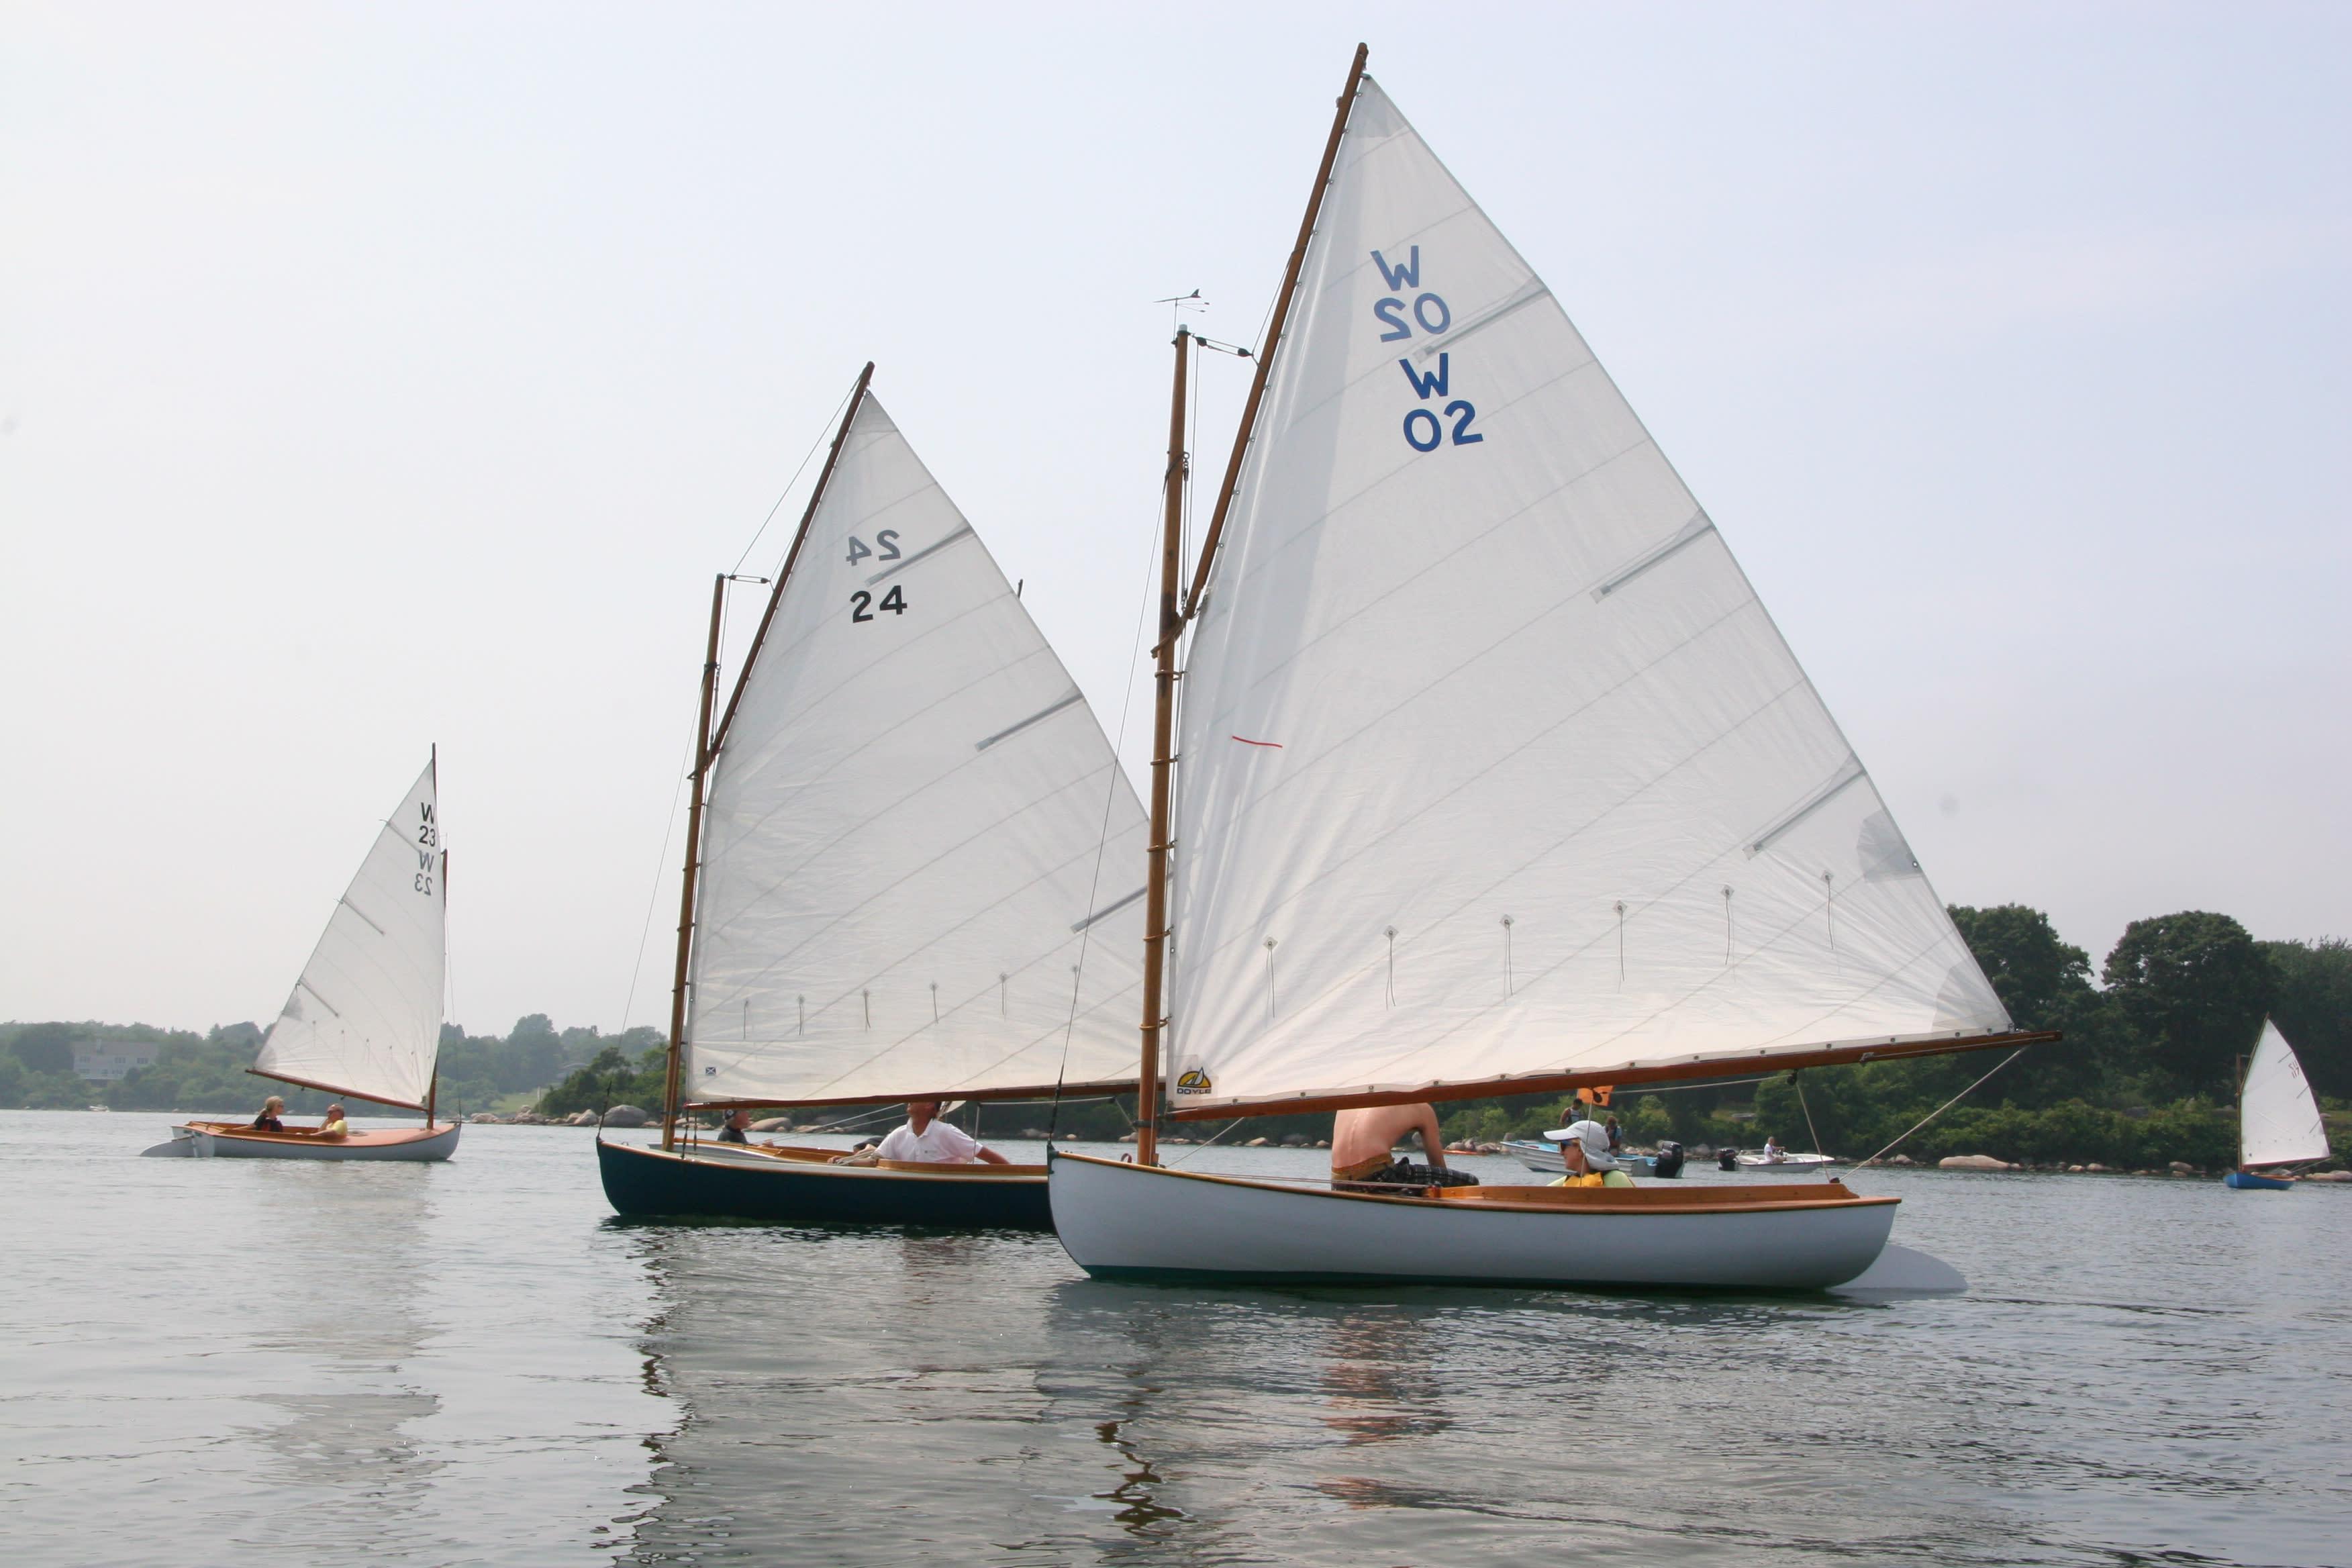 Sailboats Weekapaug Inn